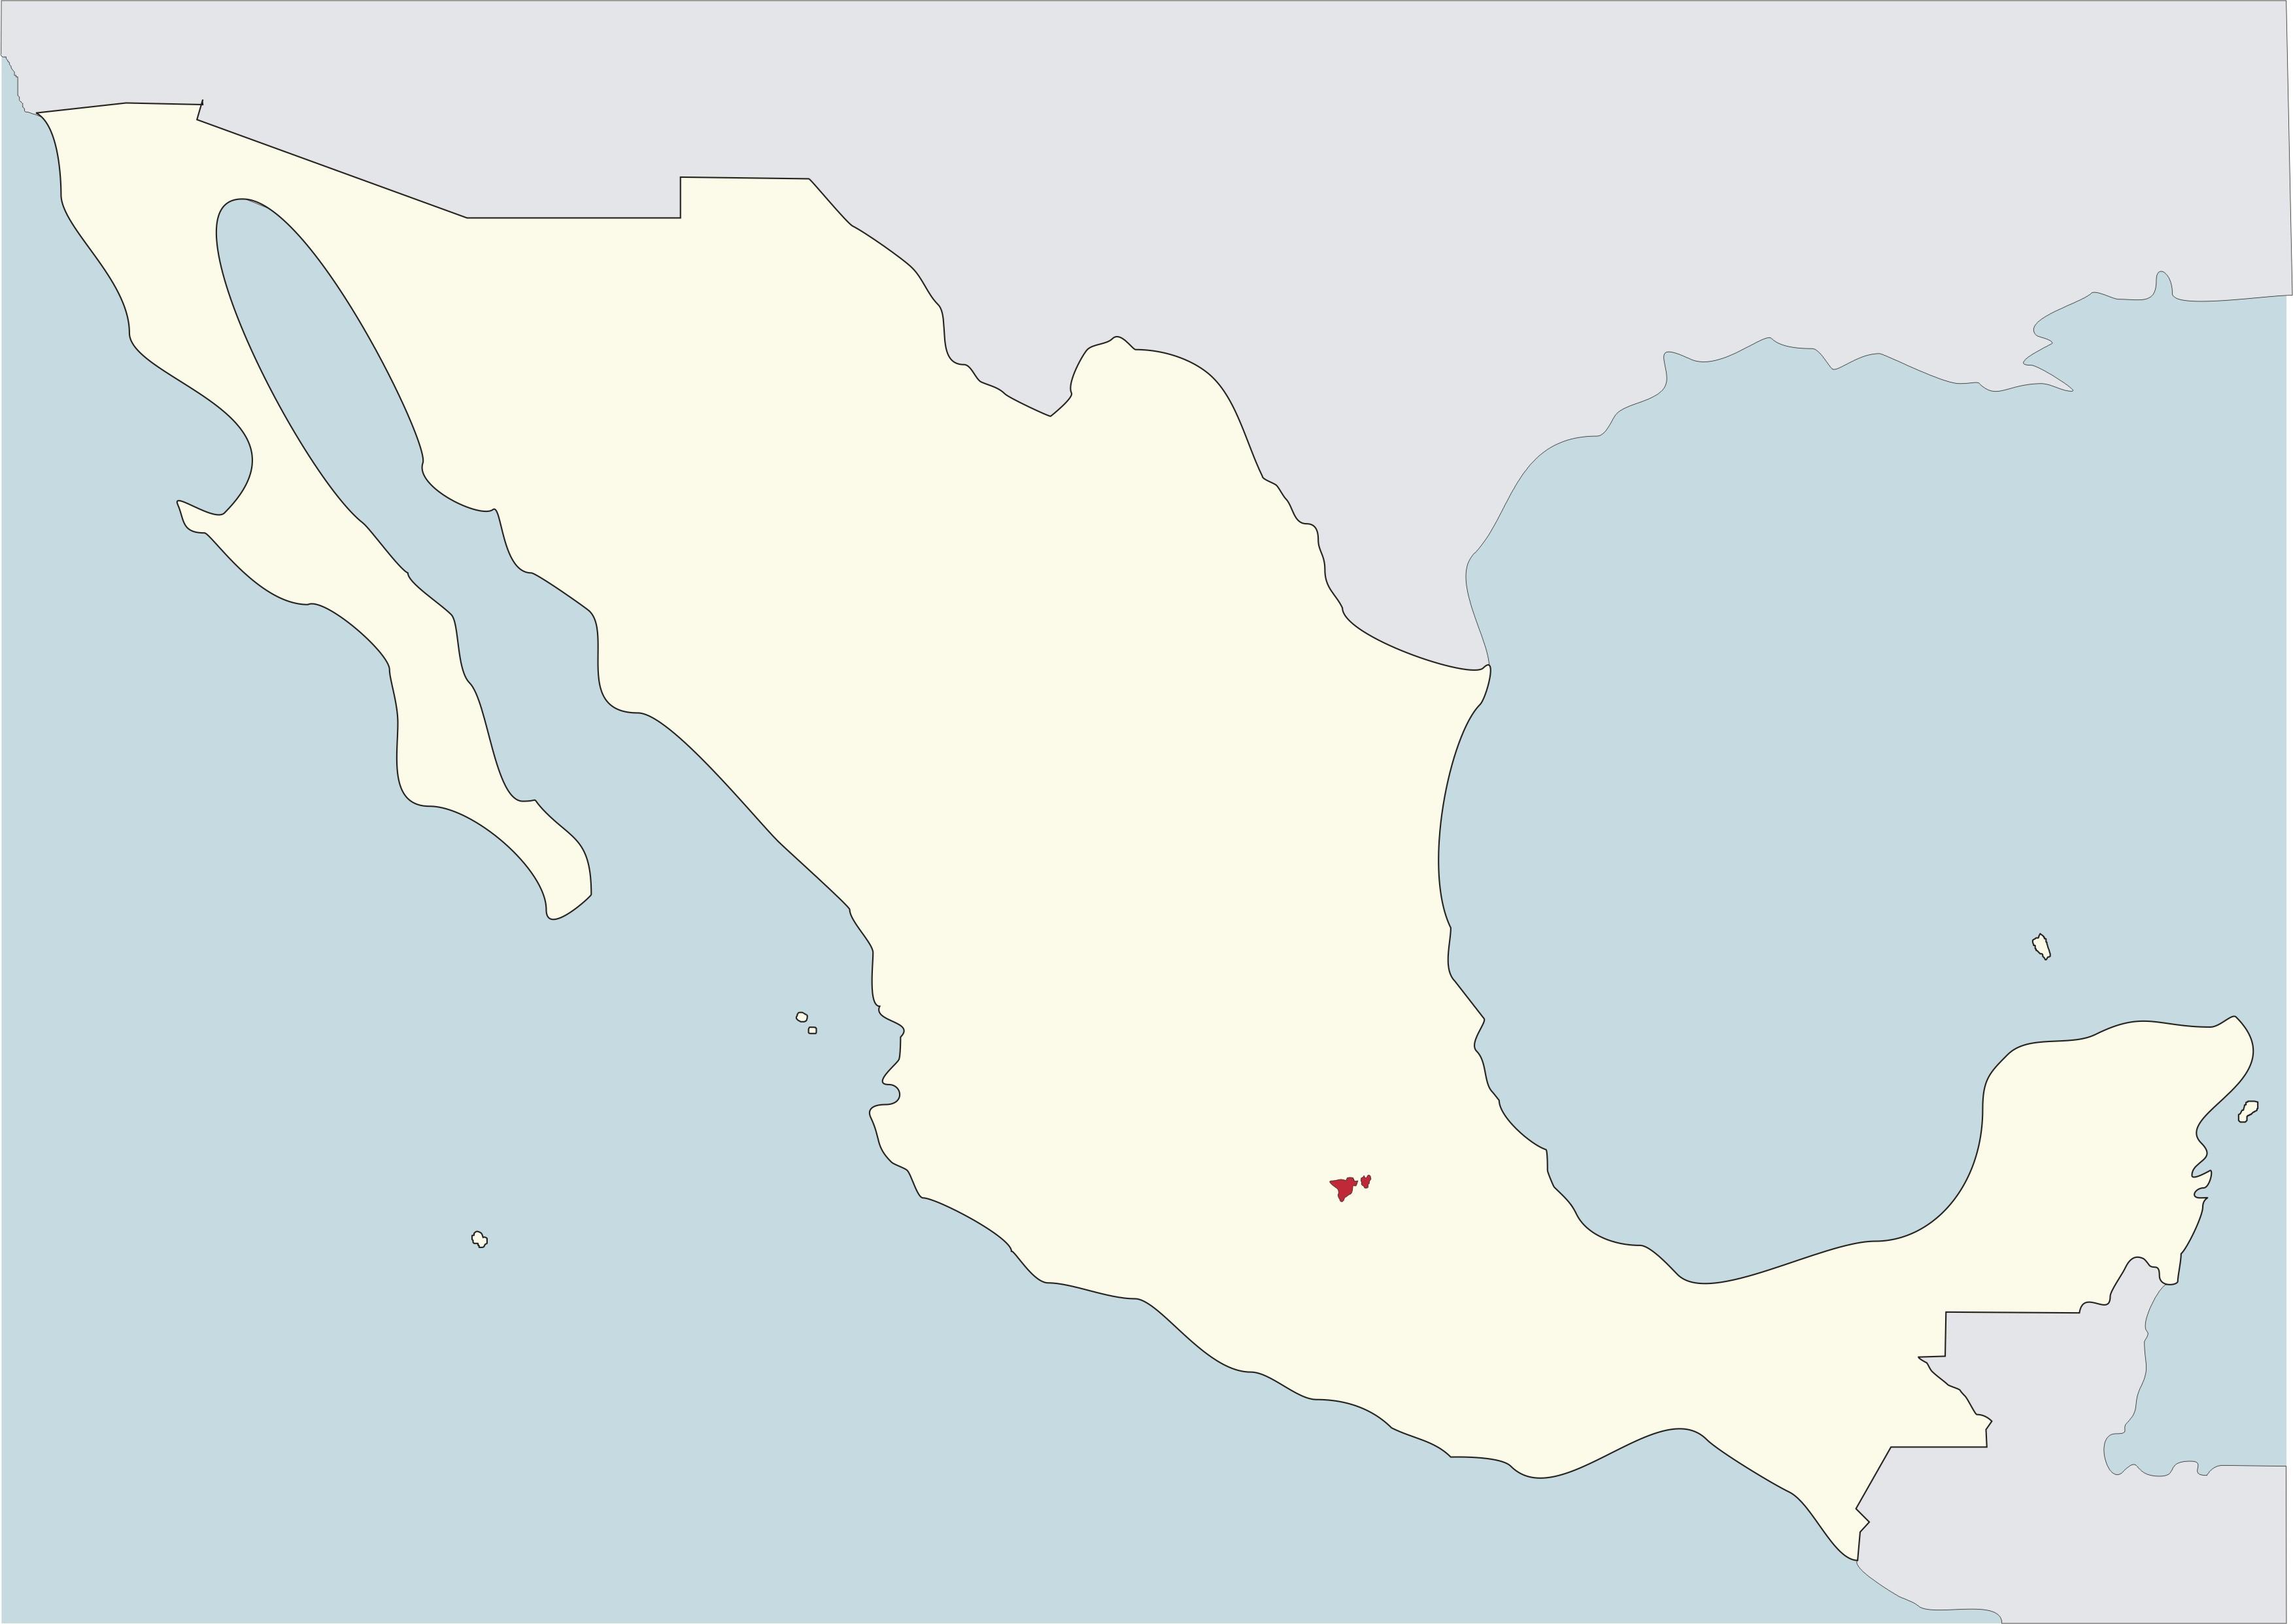 Tlalnepantla Mexico Map.File Roman Catholic Diocese Of Tlalnepantla In Mexico Jpg